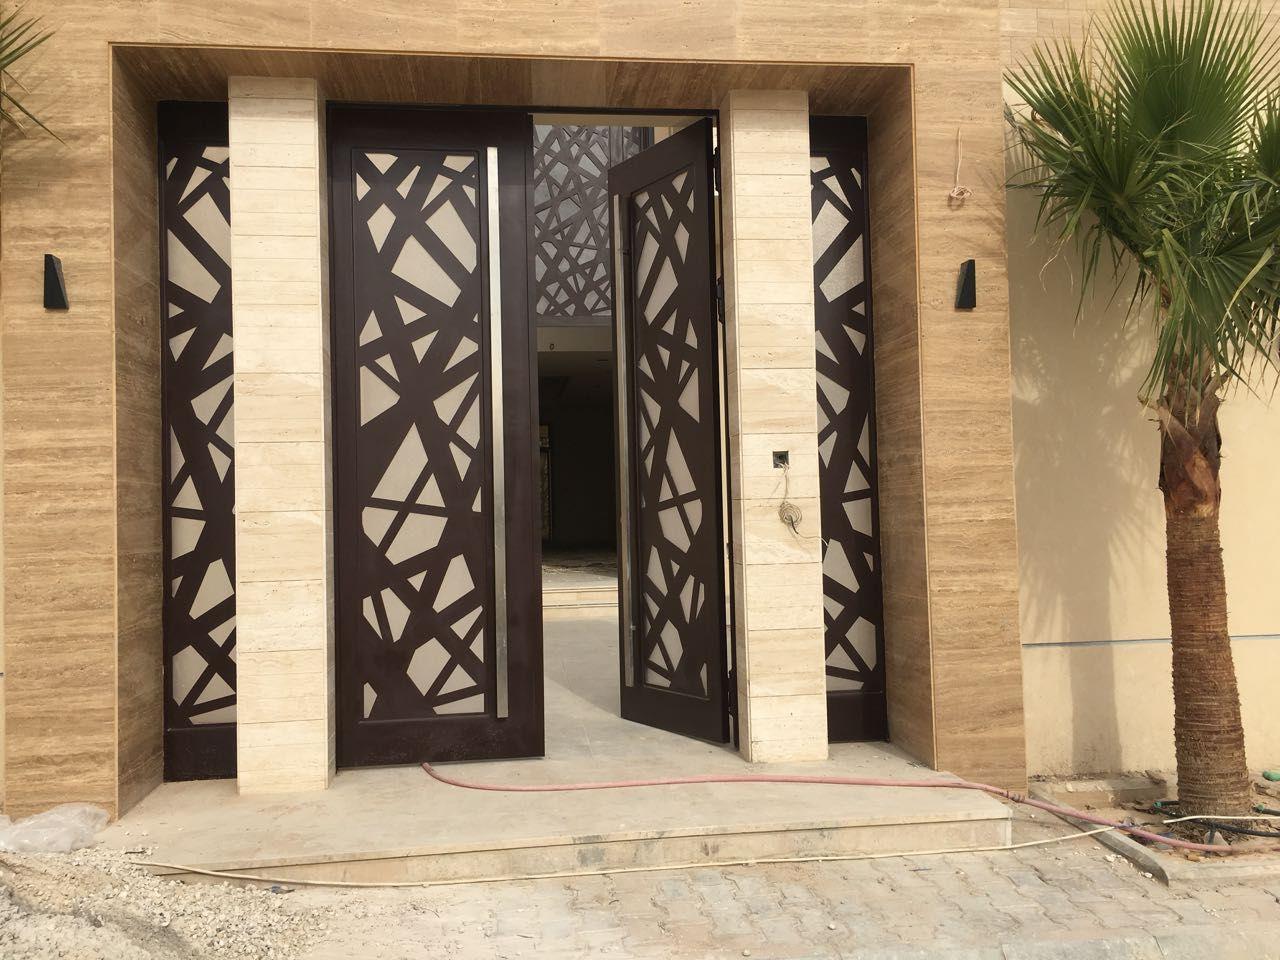 Saudiarabia Riyadh Doors Gates Design Cnc Lifestyle Modern Cadd Beautiful Metaldoor Lasercut Door Gate Design Door Glass Design Metal Doors Design